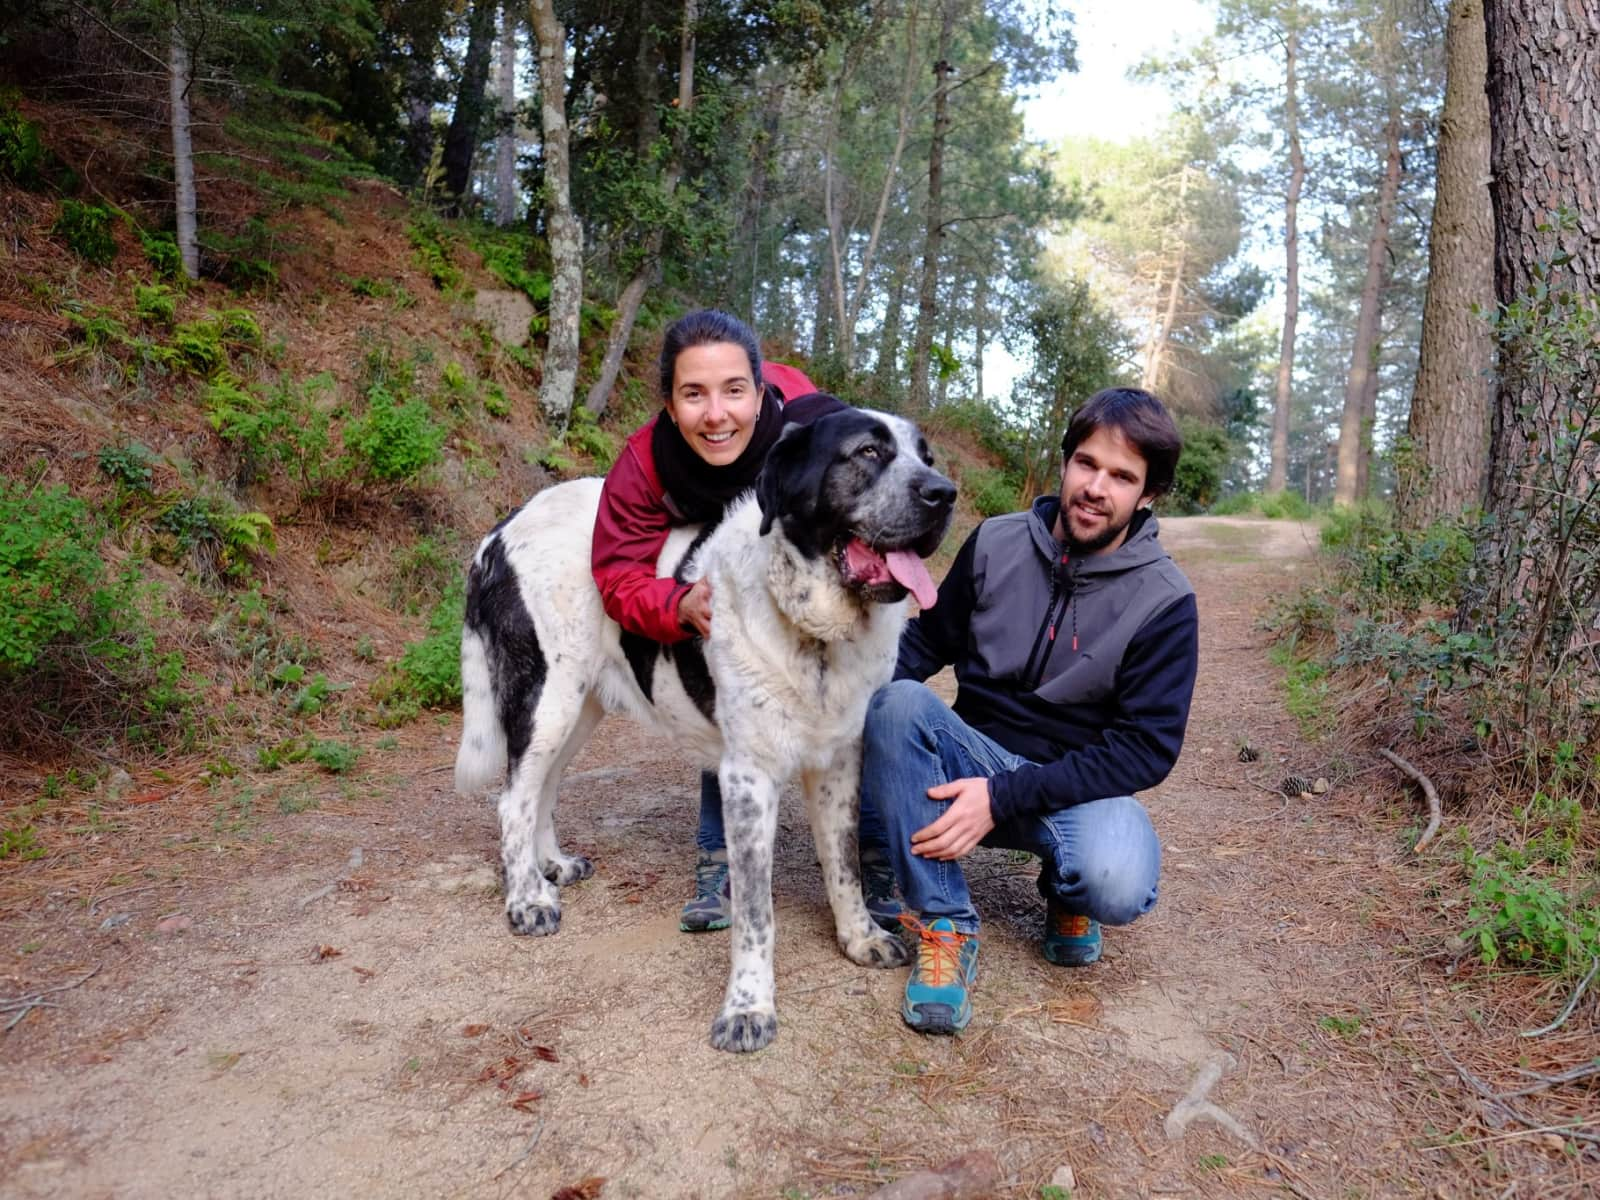 Marta & Andreu from Barcelona, Spain